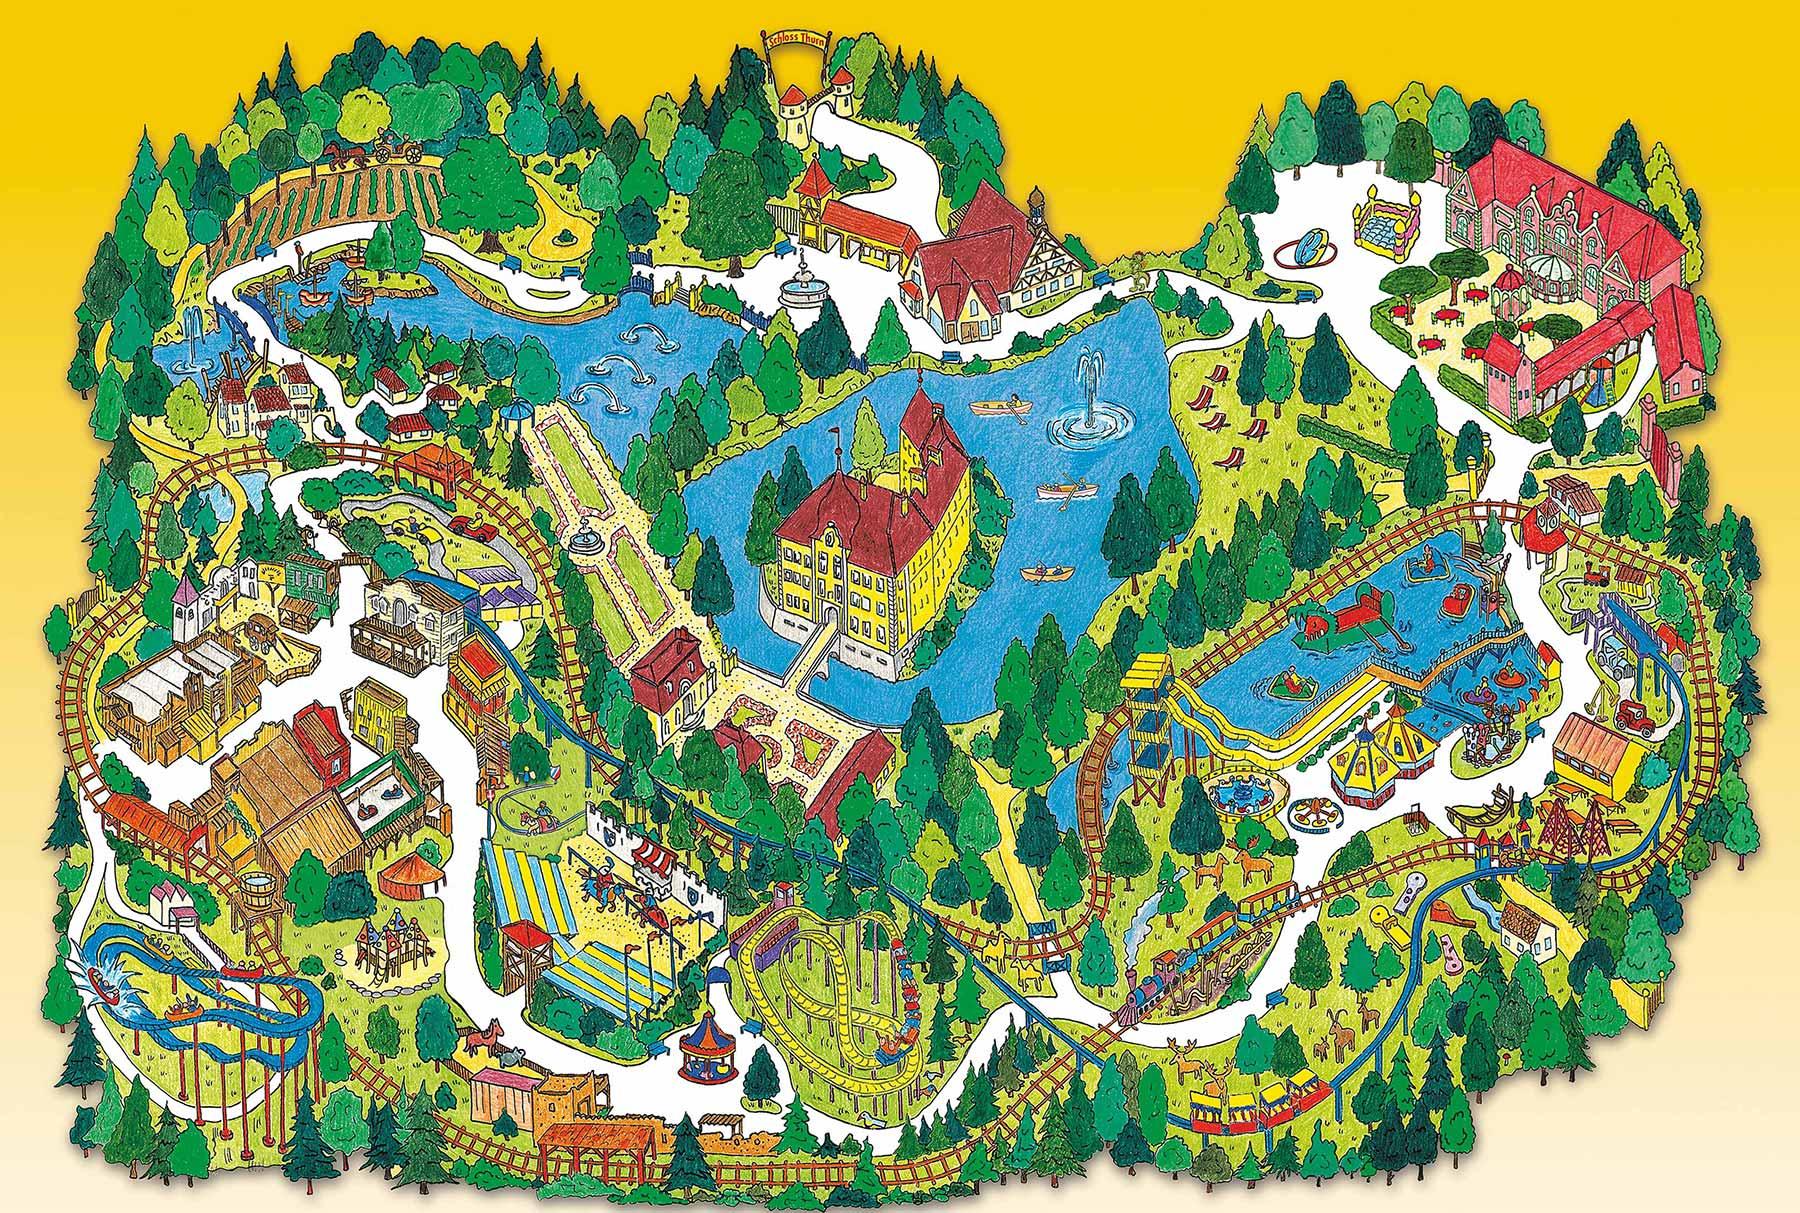 Parkplan Erlebnispark Schloss Thurn